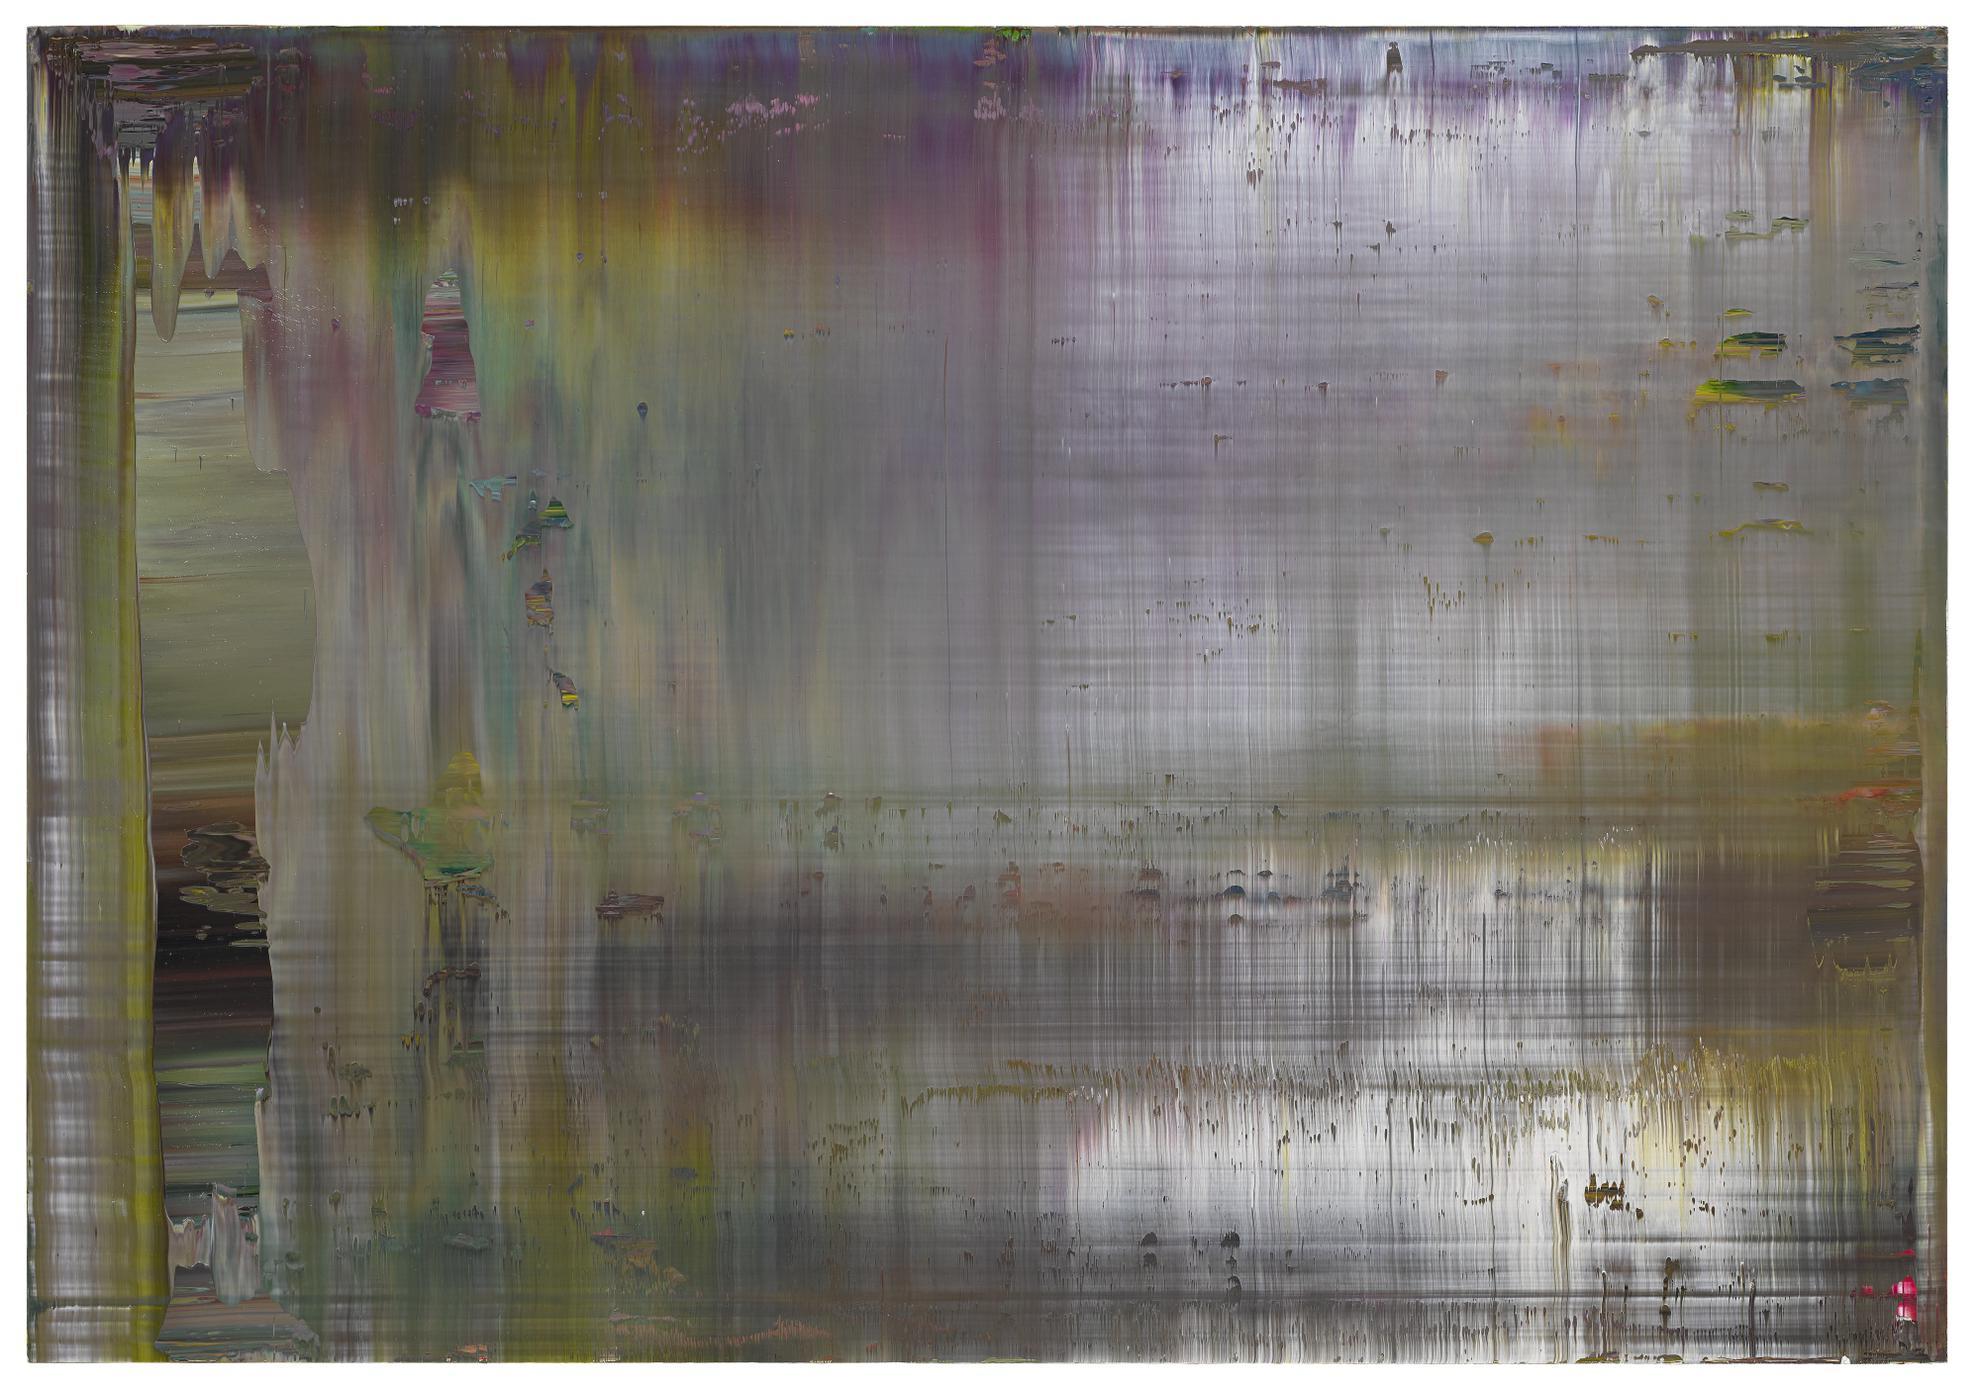 Gerhard Richter-Abstraktes Bild (840-6)-1997